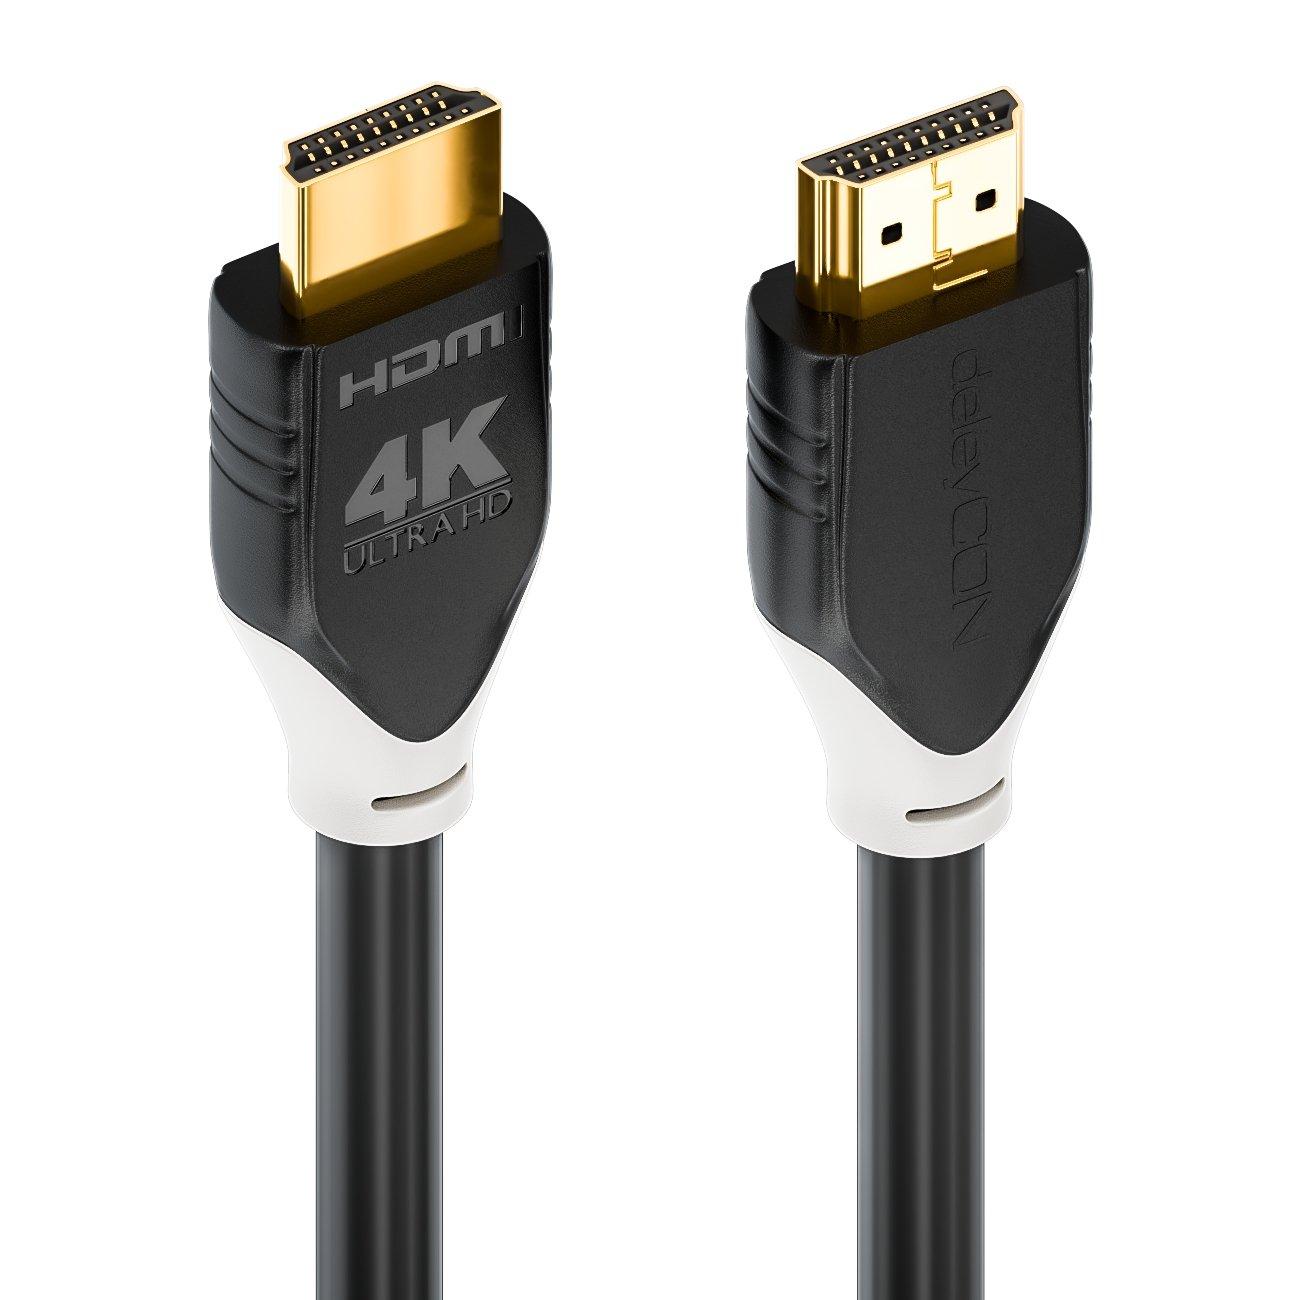 UHD 4K@60Hz YUV 4:4:4 HDCP 2.2 3D ARC Weiß deleyCON 5m HDMI Kabel HDR10